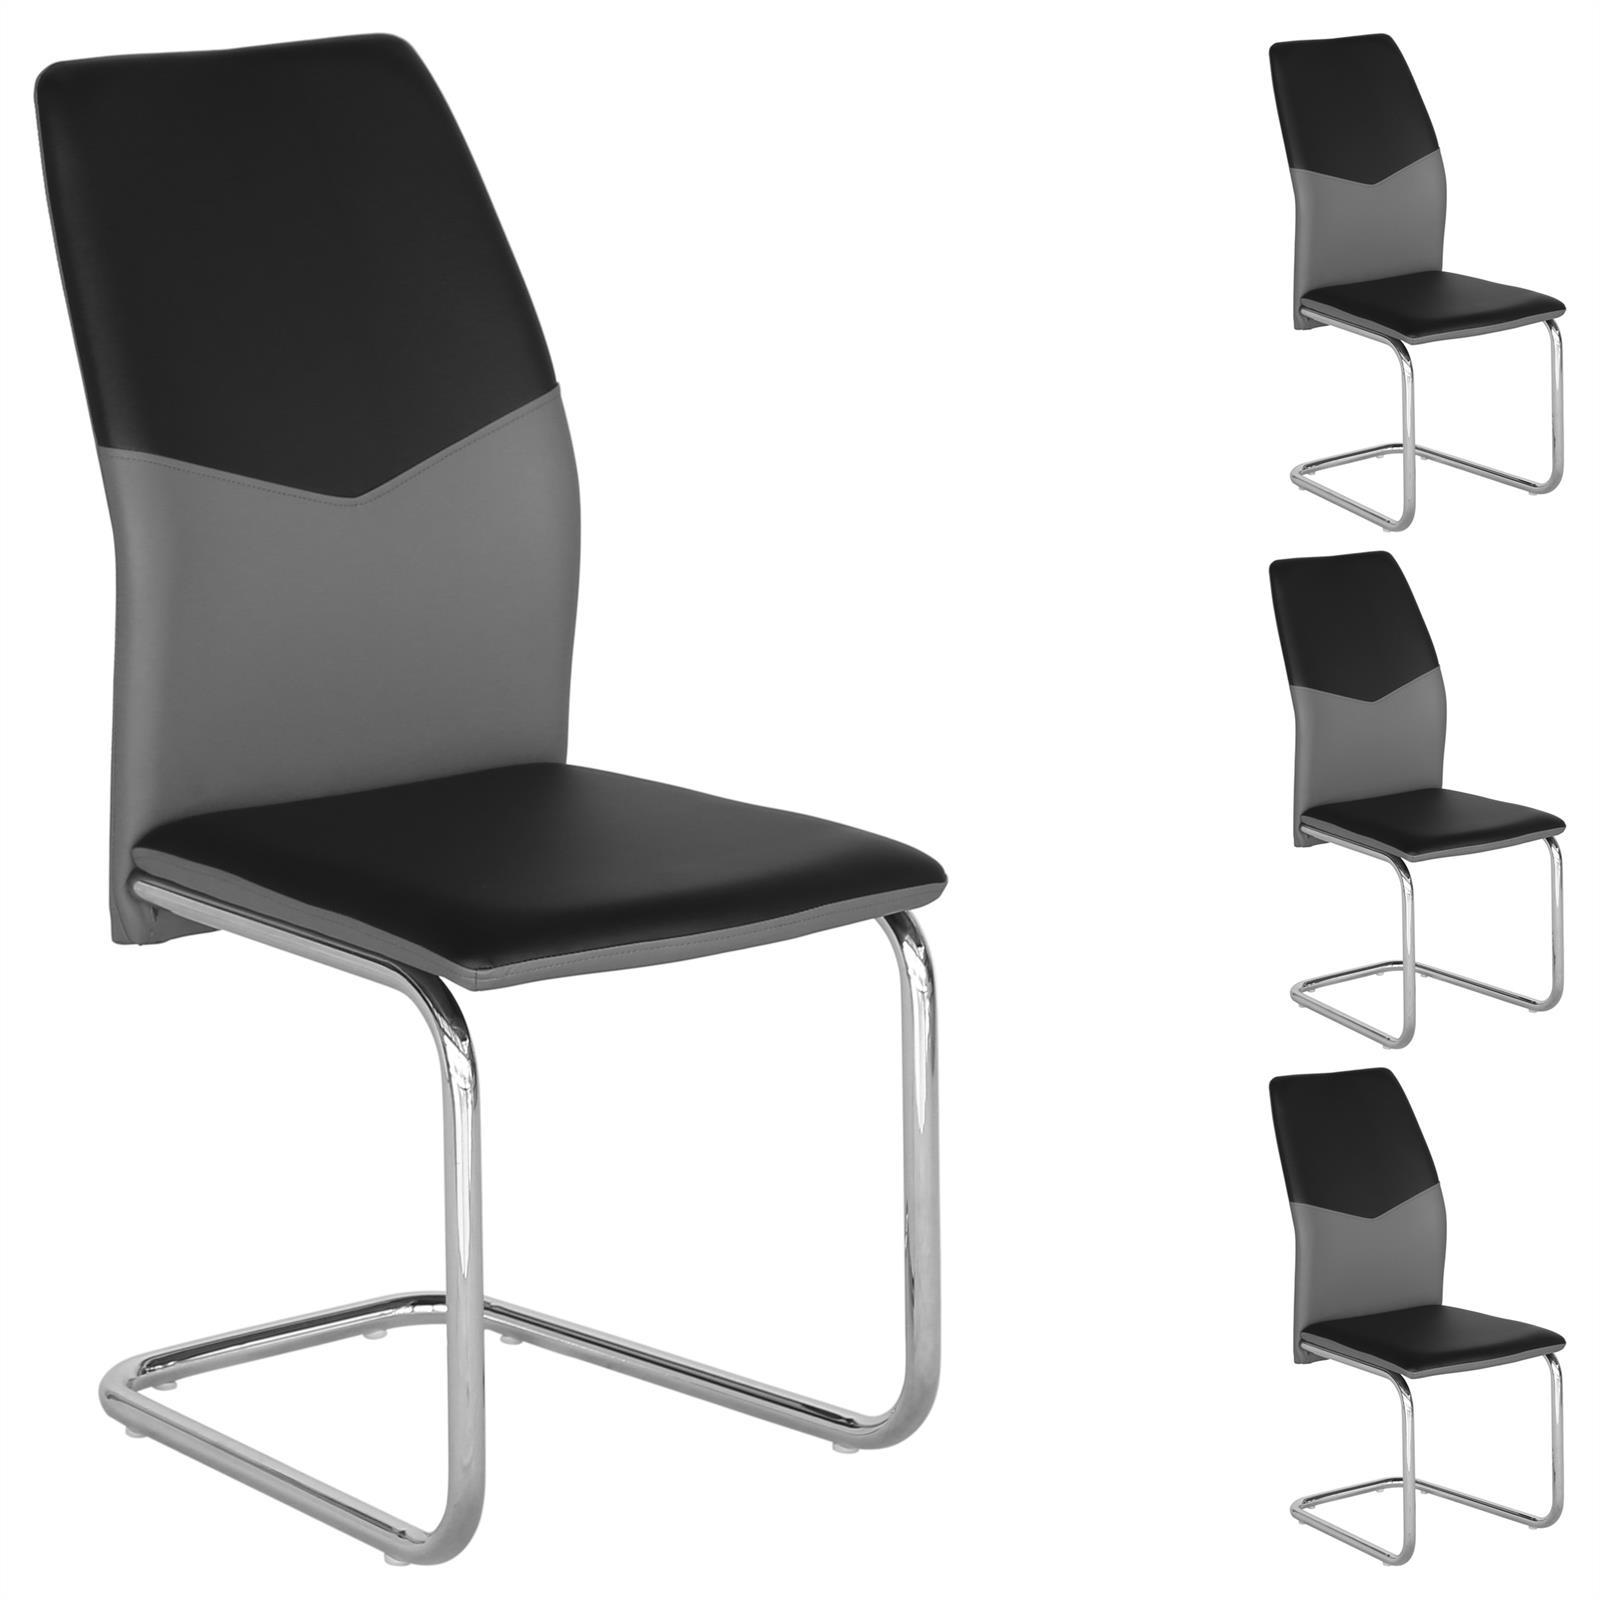 schwingstuhl esszimmerstuhl freischwinger 4er set in 6 farben gestell verchromt ebay. Black Bedroom Furniture Sets. Home Design Ideas